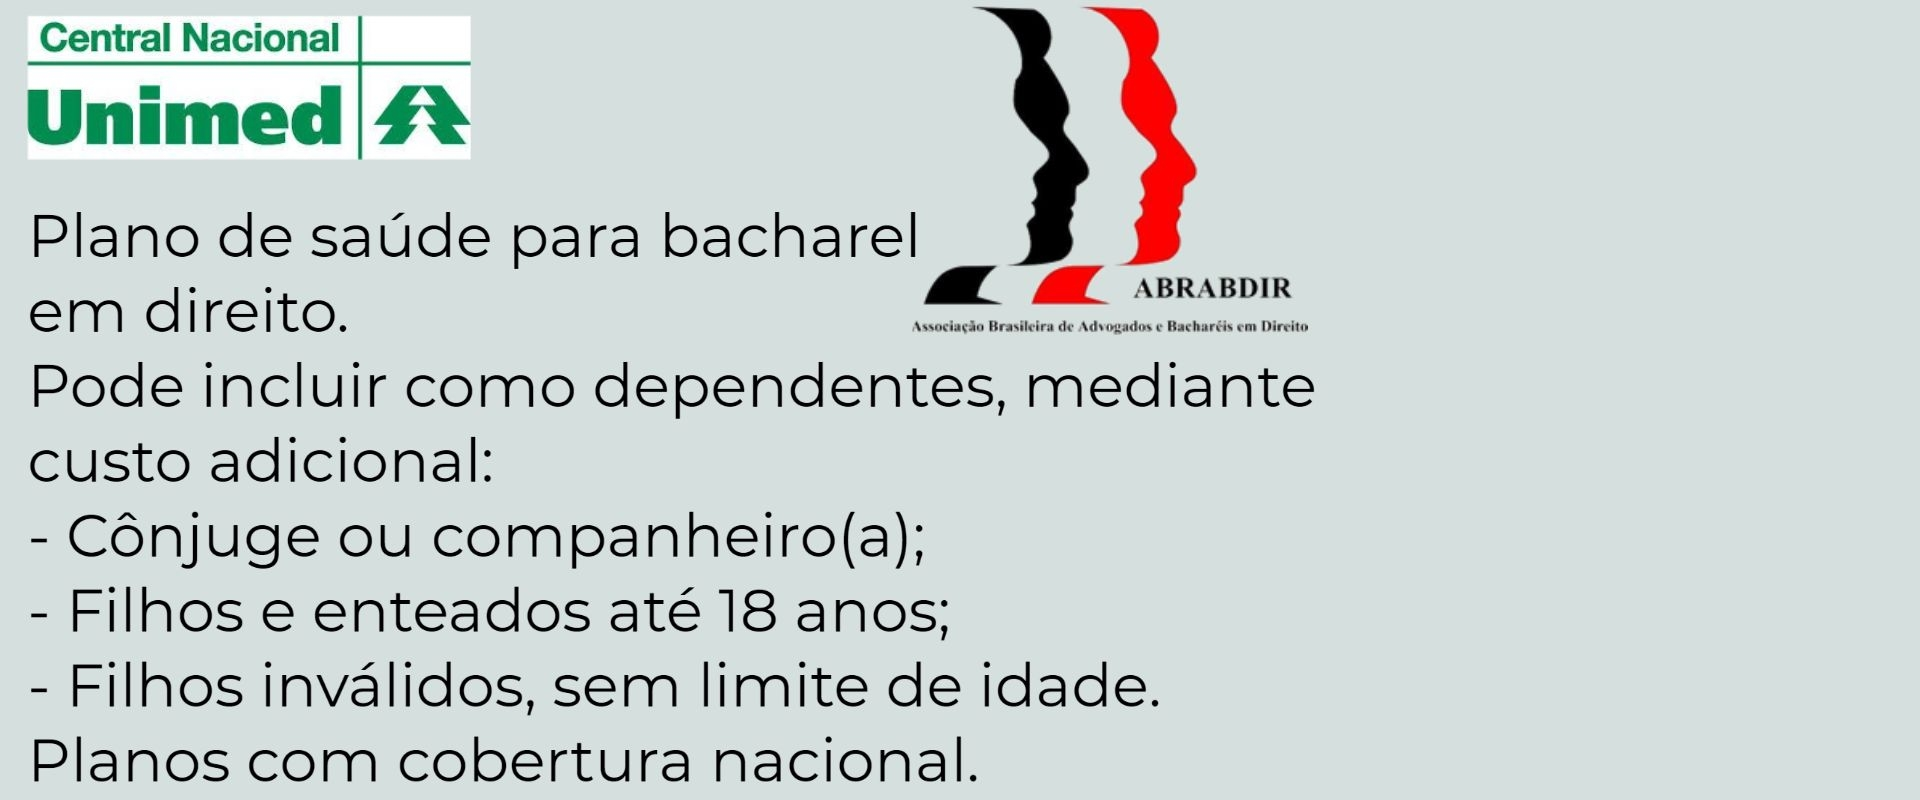 Unimed ABRABDIR Sorocaba